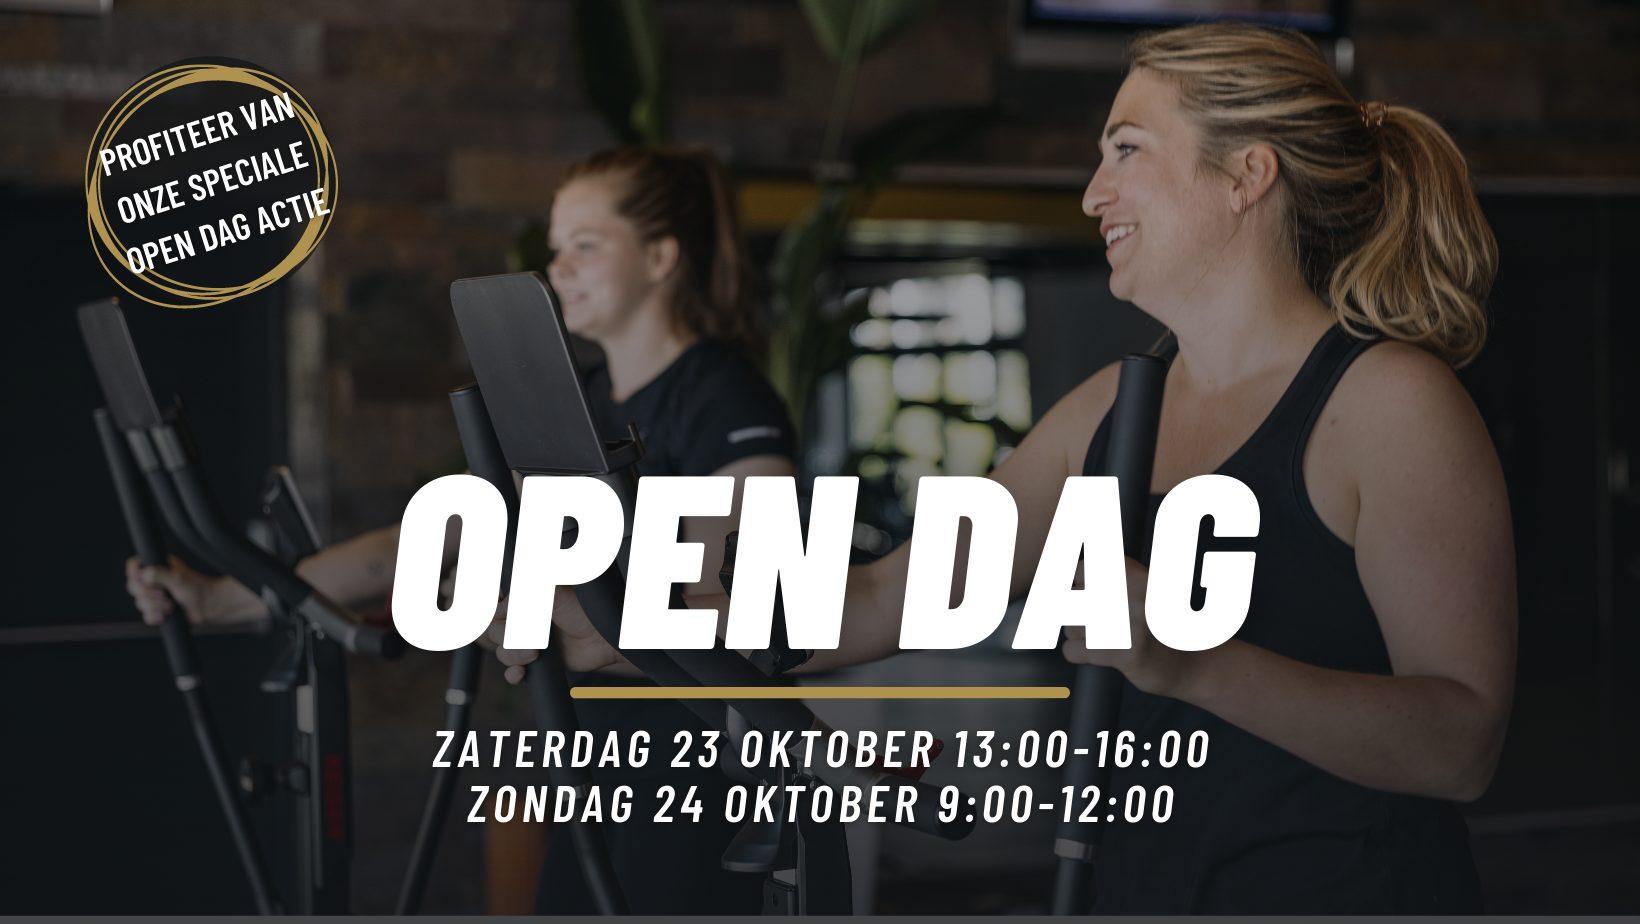 OPEN DAG FACEBOOK (Facebook-omslagfoto)